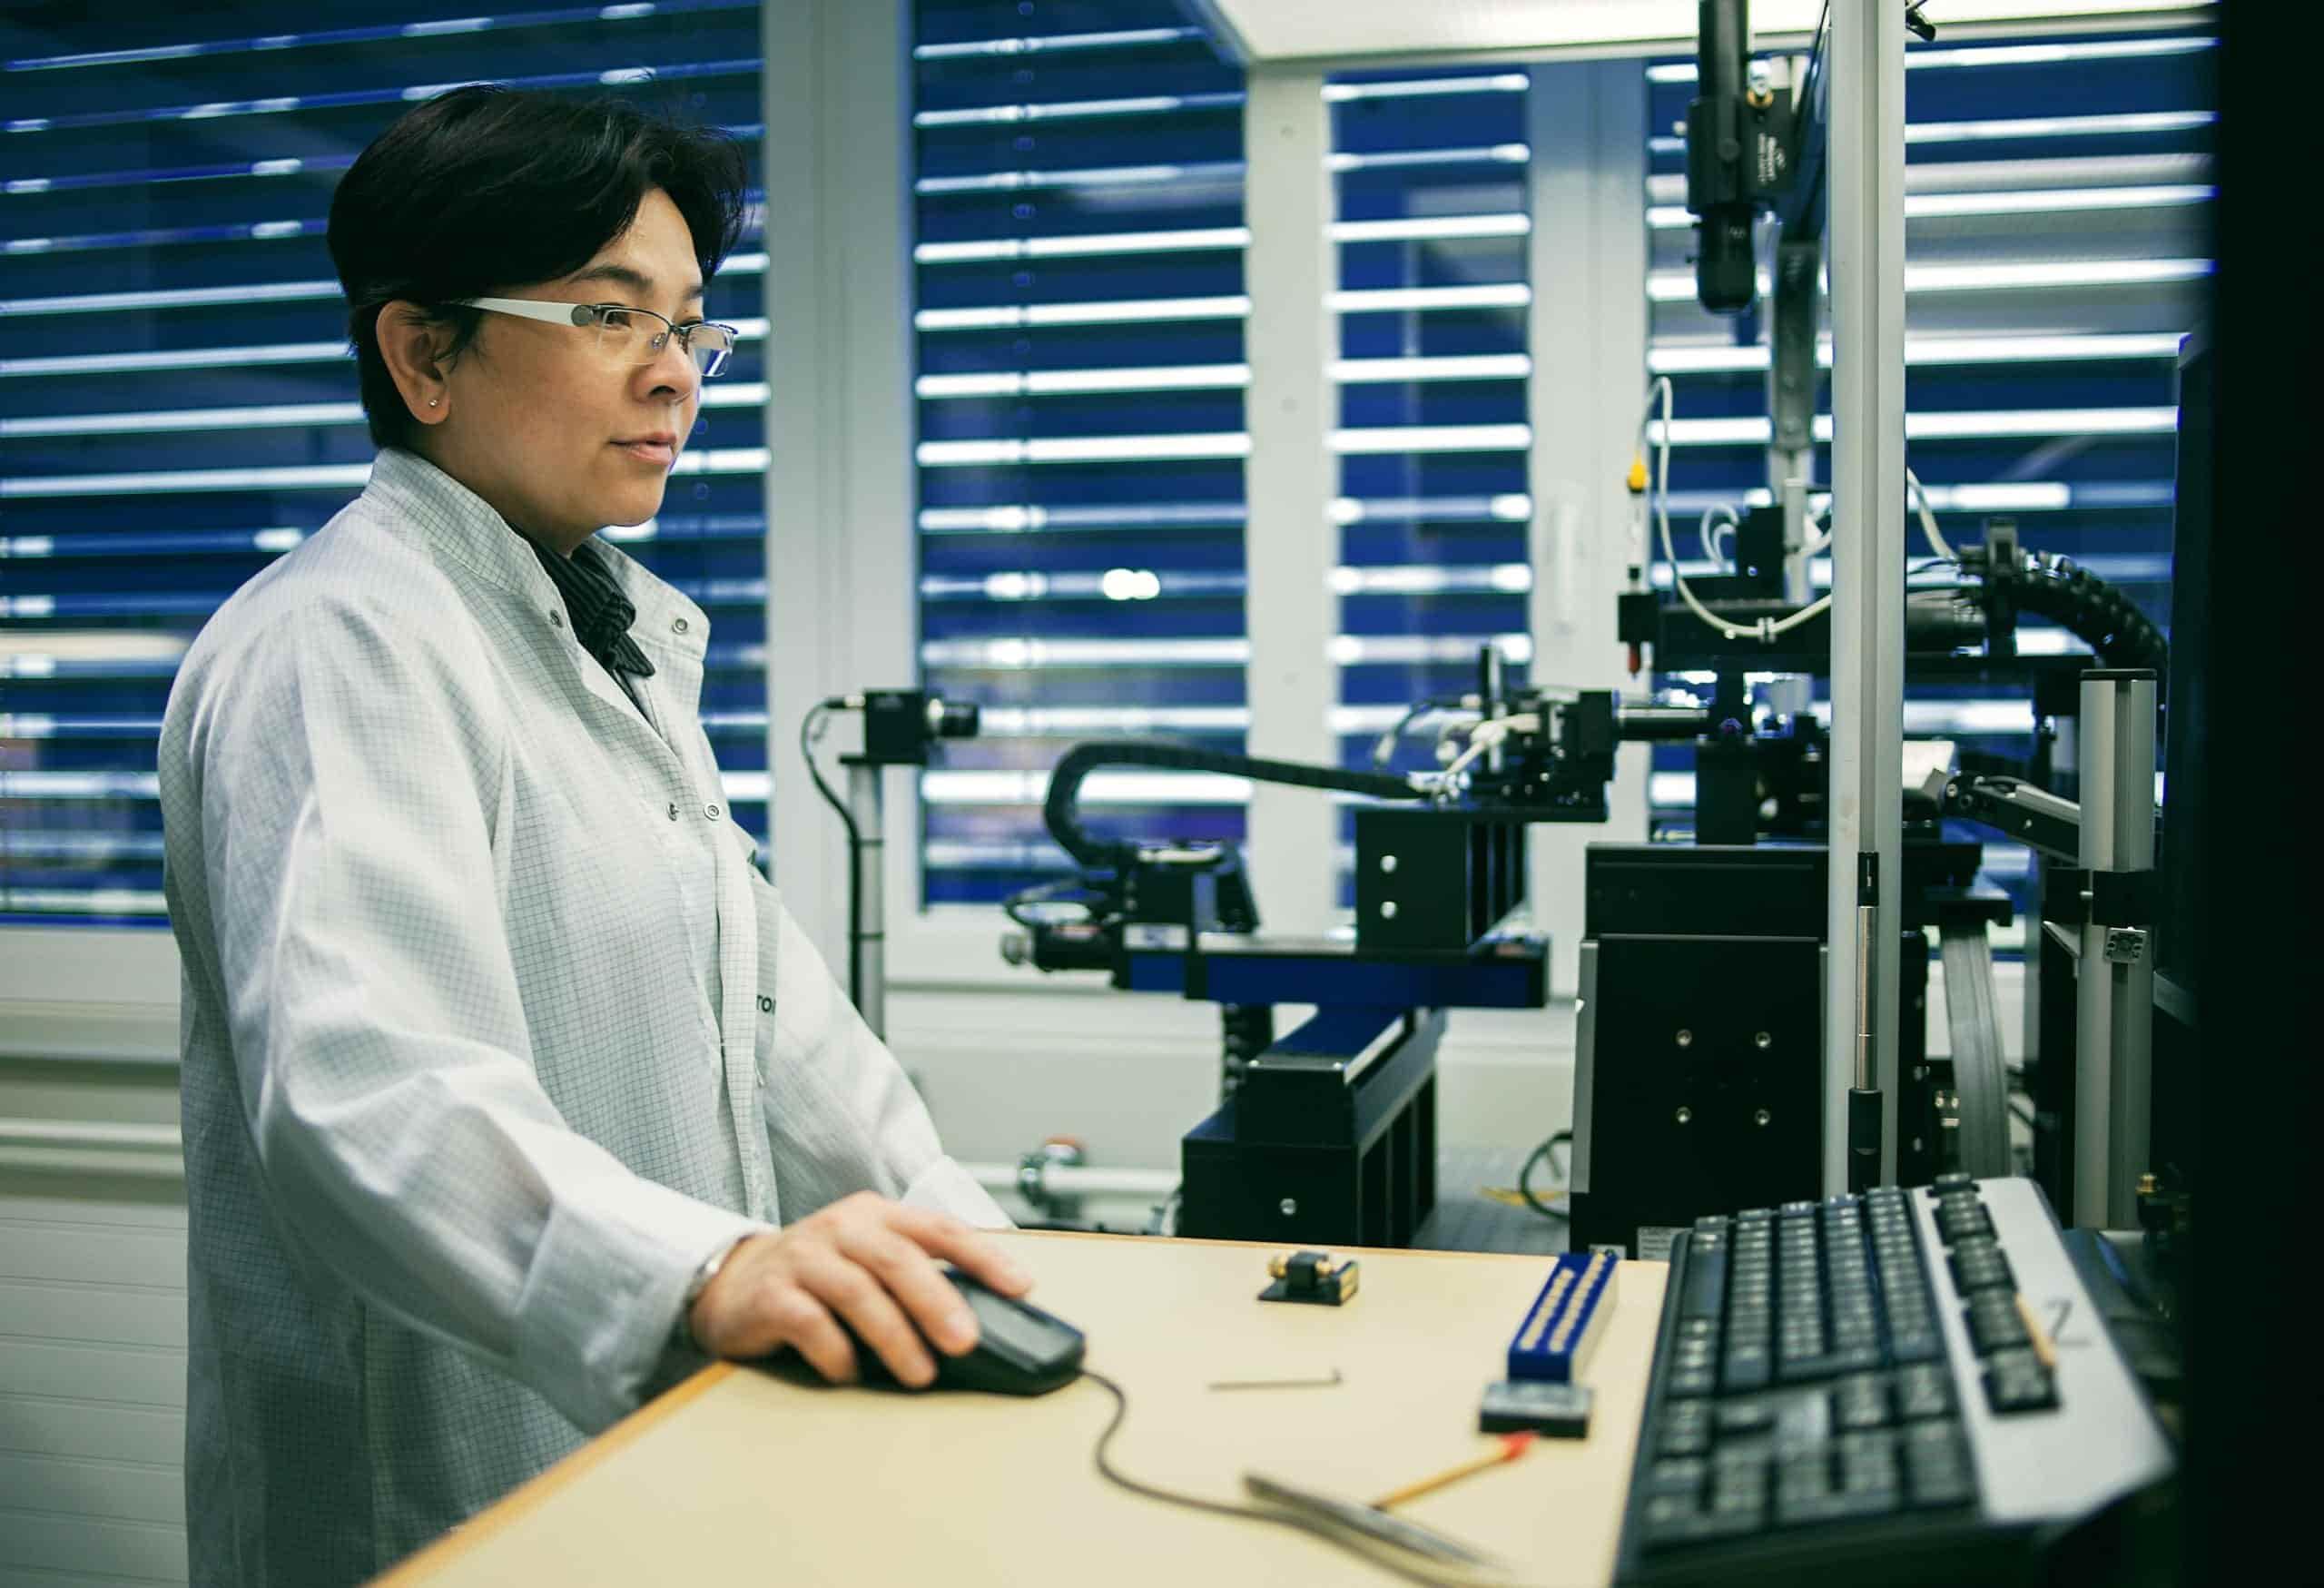 Production and engineering at Safran Vectronix